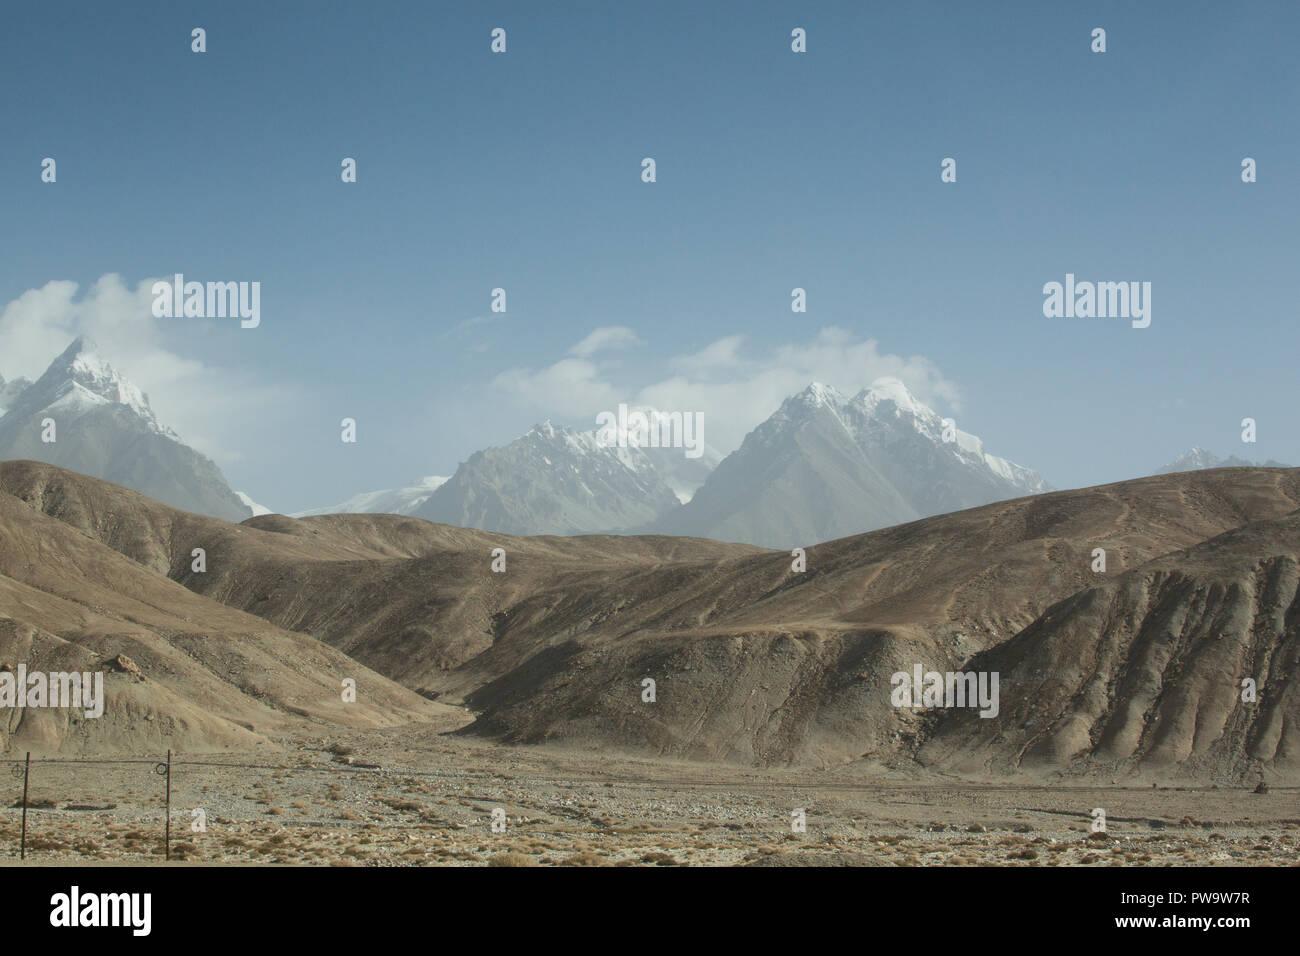 Mt Kongur, Karakoram Highway, Xinjiang Region, China - Stock Image